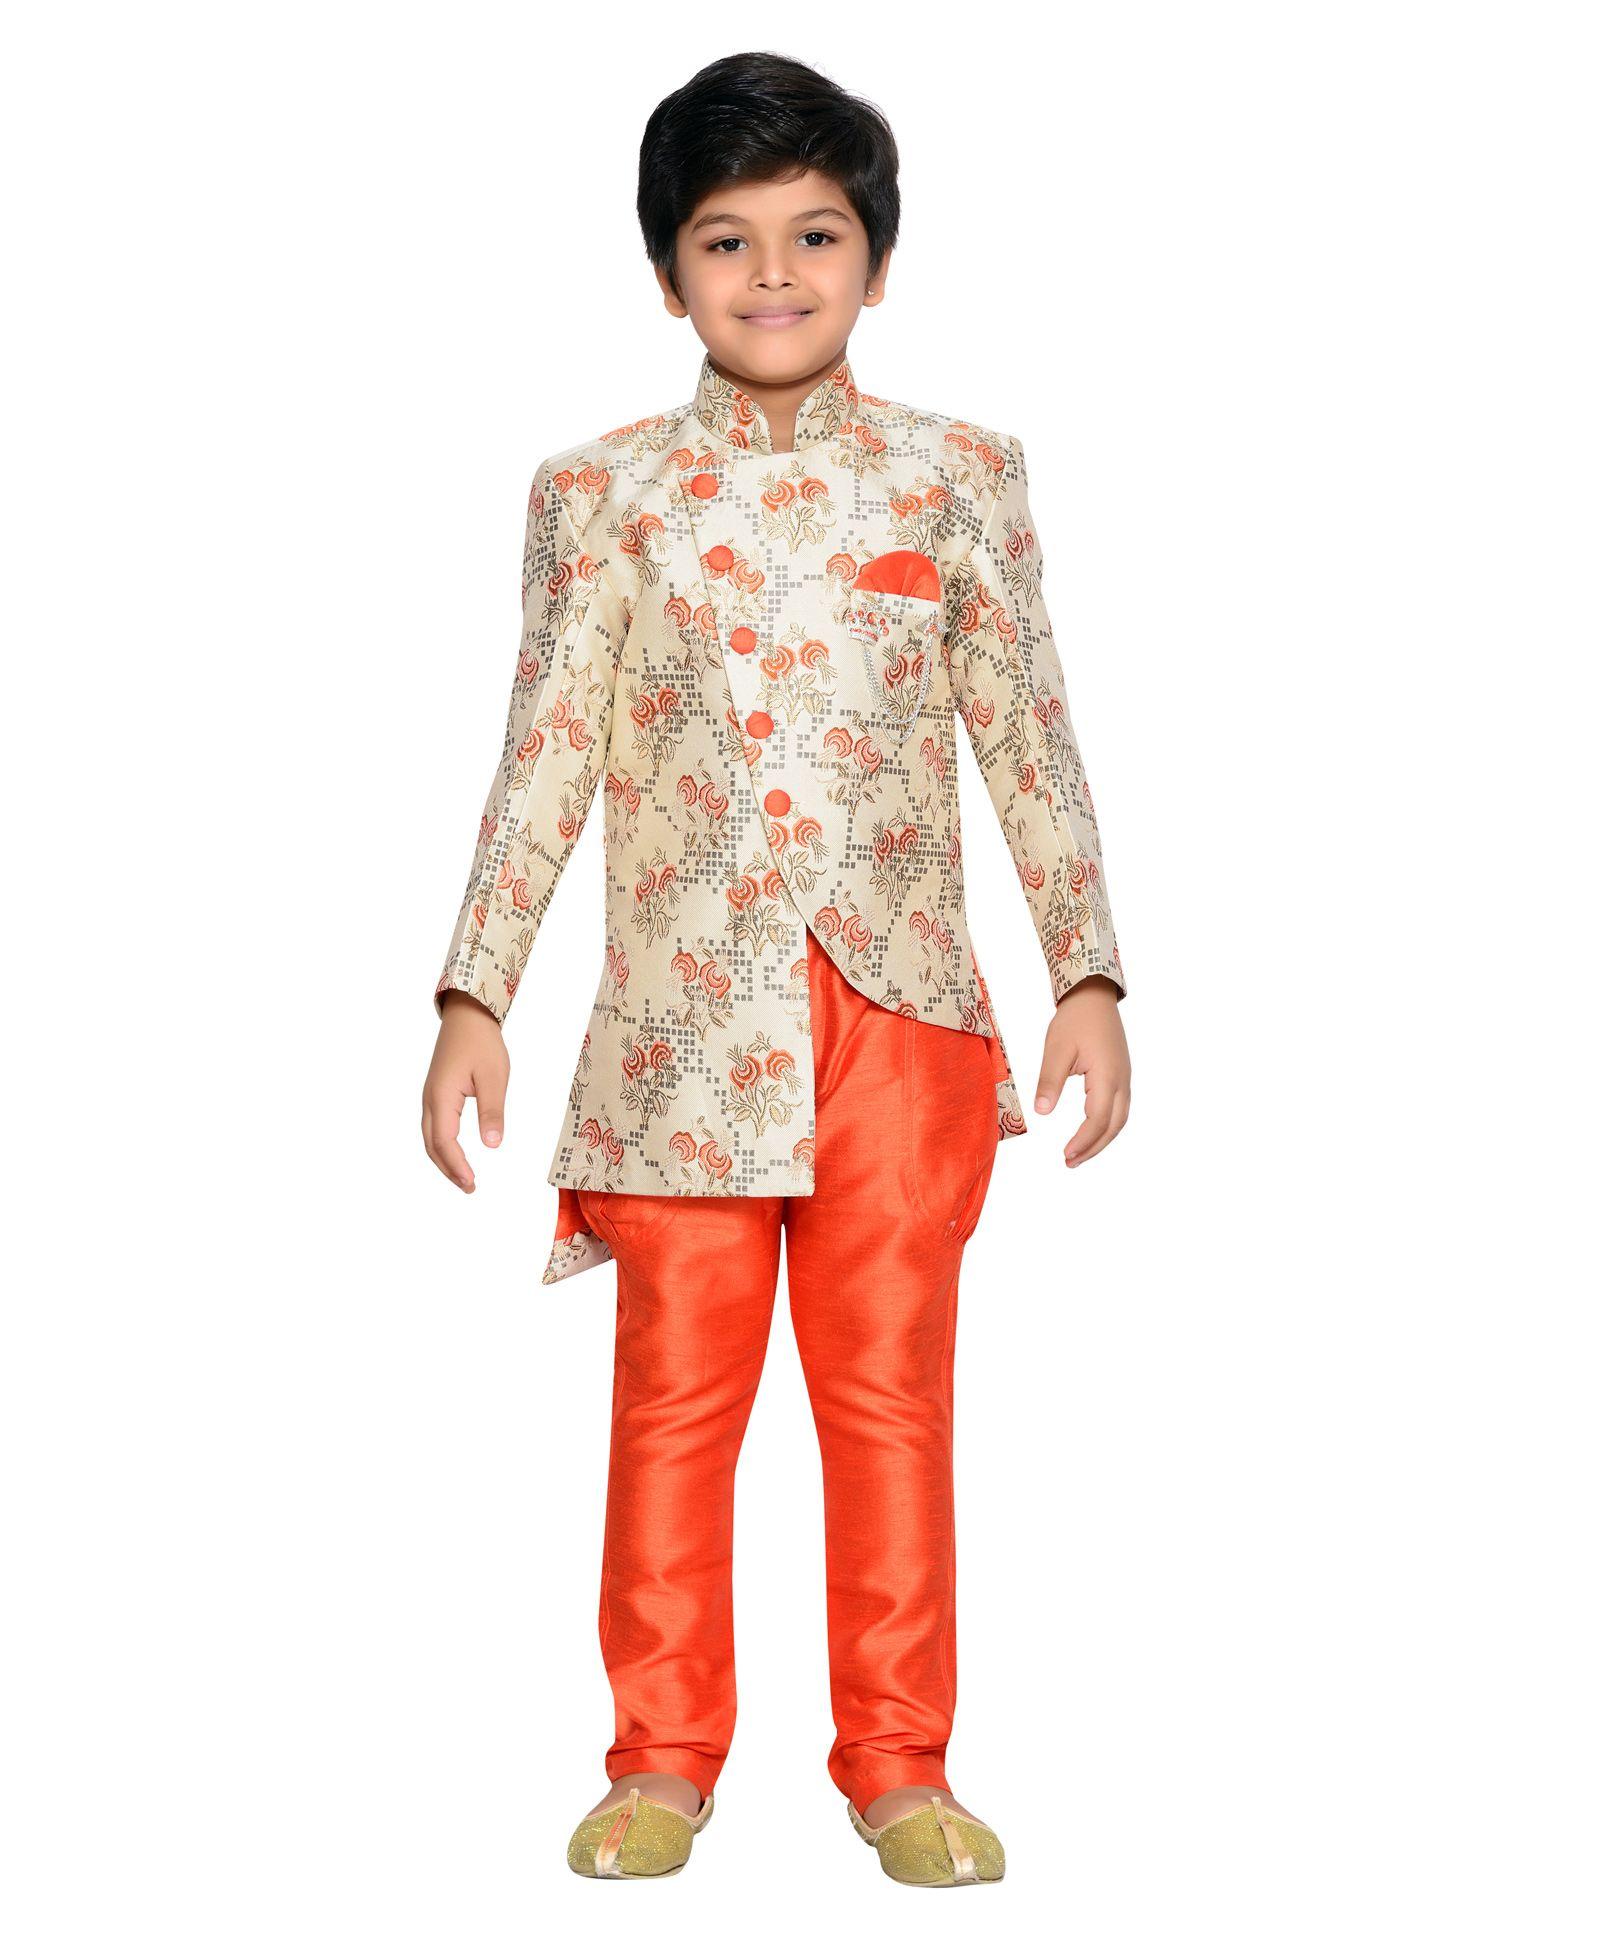 5f3d8330b2 Buy Aj Dezines Embroidered Full Sleeves Sherwani & Pyjama Set Orange for  Boys (3-4 Years) Online in India, Shop at FirstCry.com - 2851012